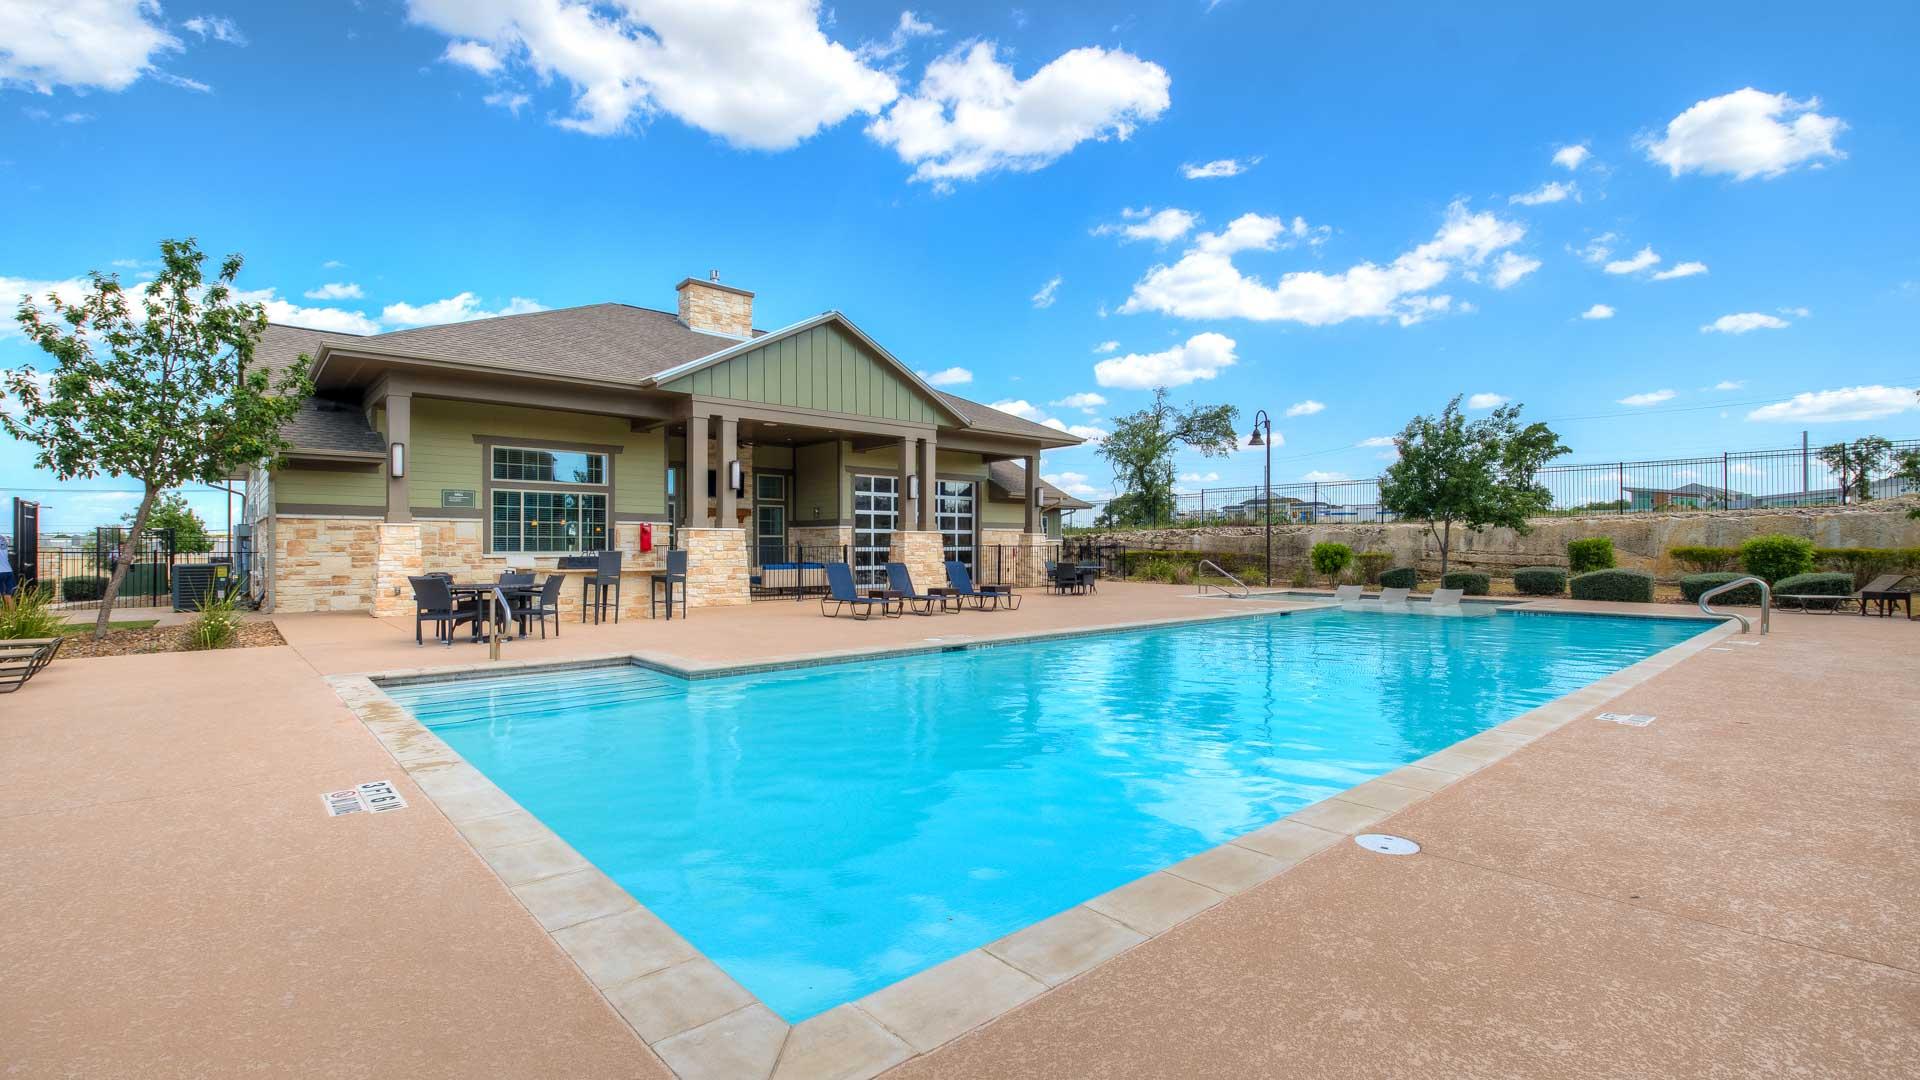 Pool in San Antonio at Springs at Alamo Ranch